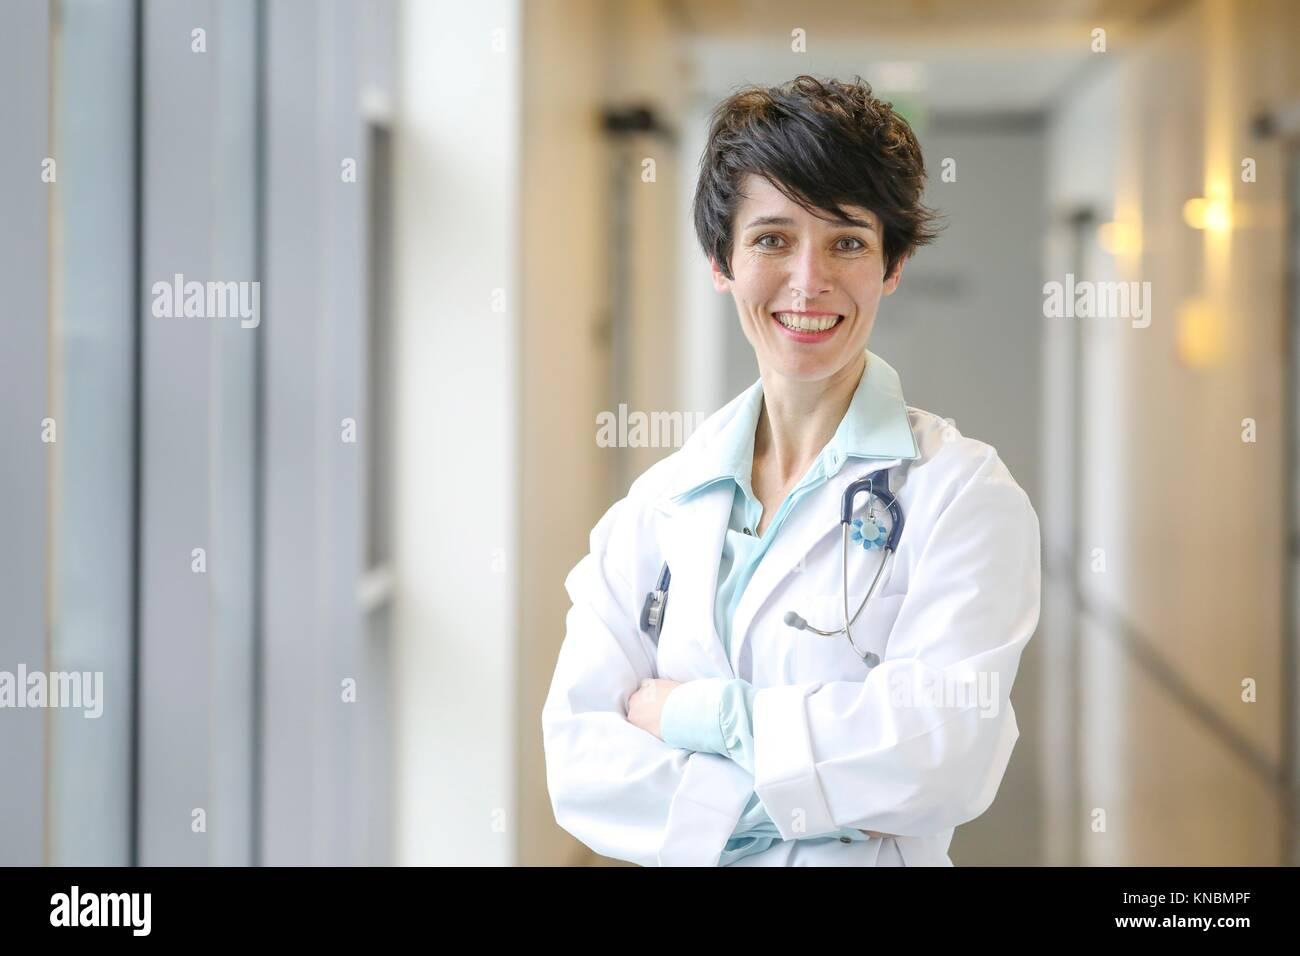 Doctor in corridor, Hospital - Stock Image